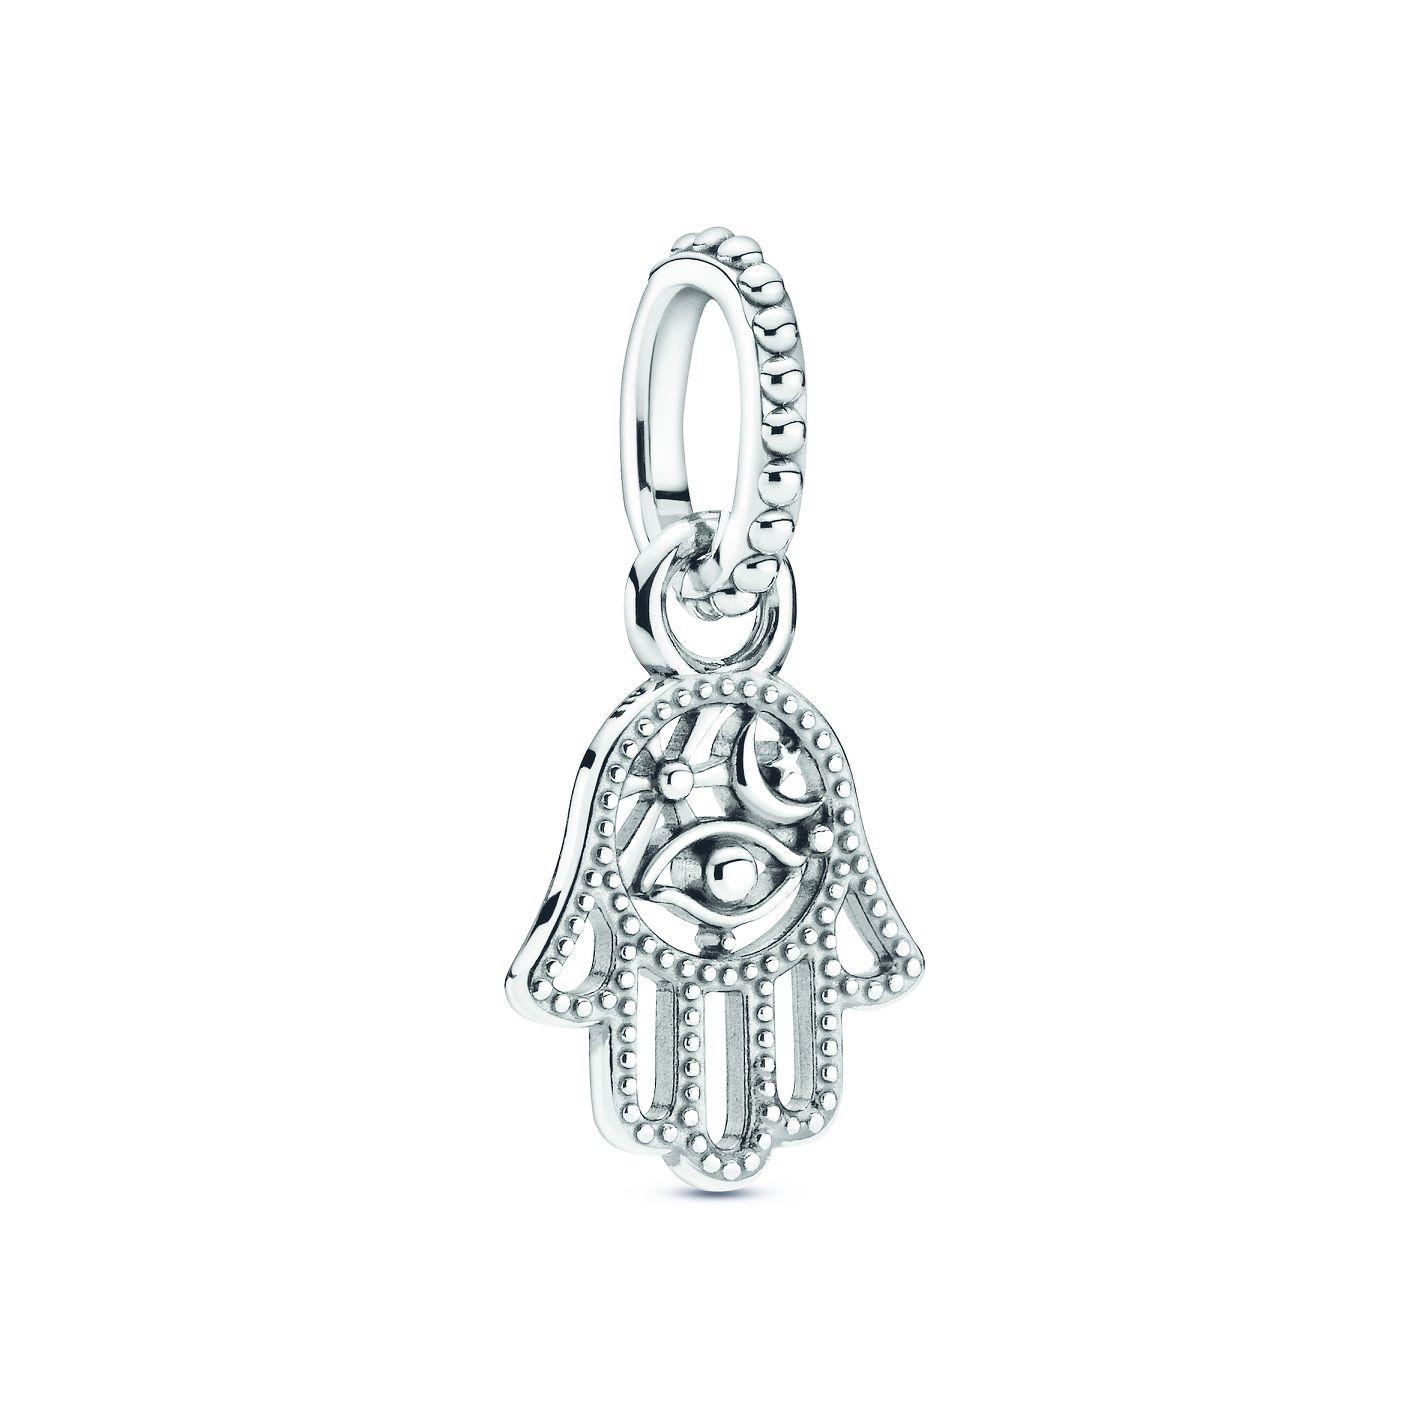 Pandora-Symbols-Protective-Hamsa-Hand-Dangle-Charm - THE EDGE SINGAPORE